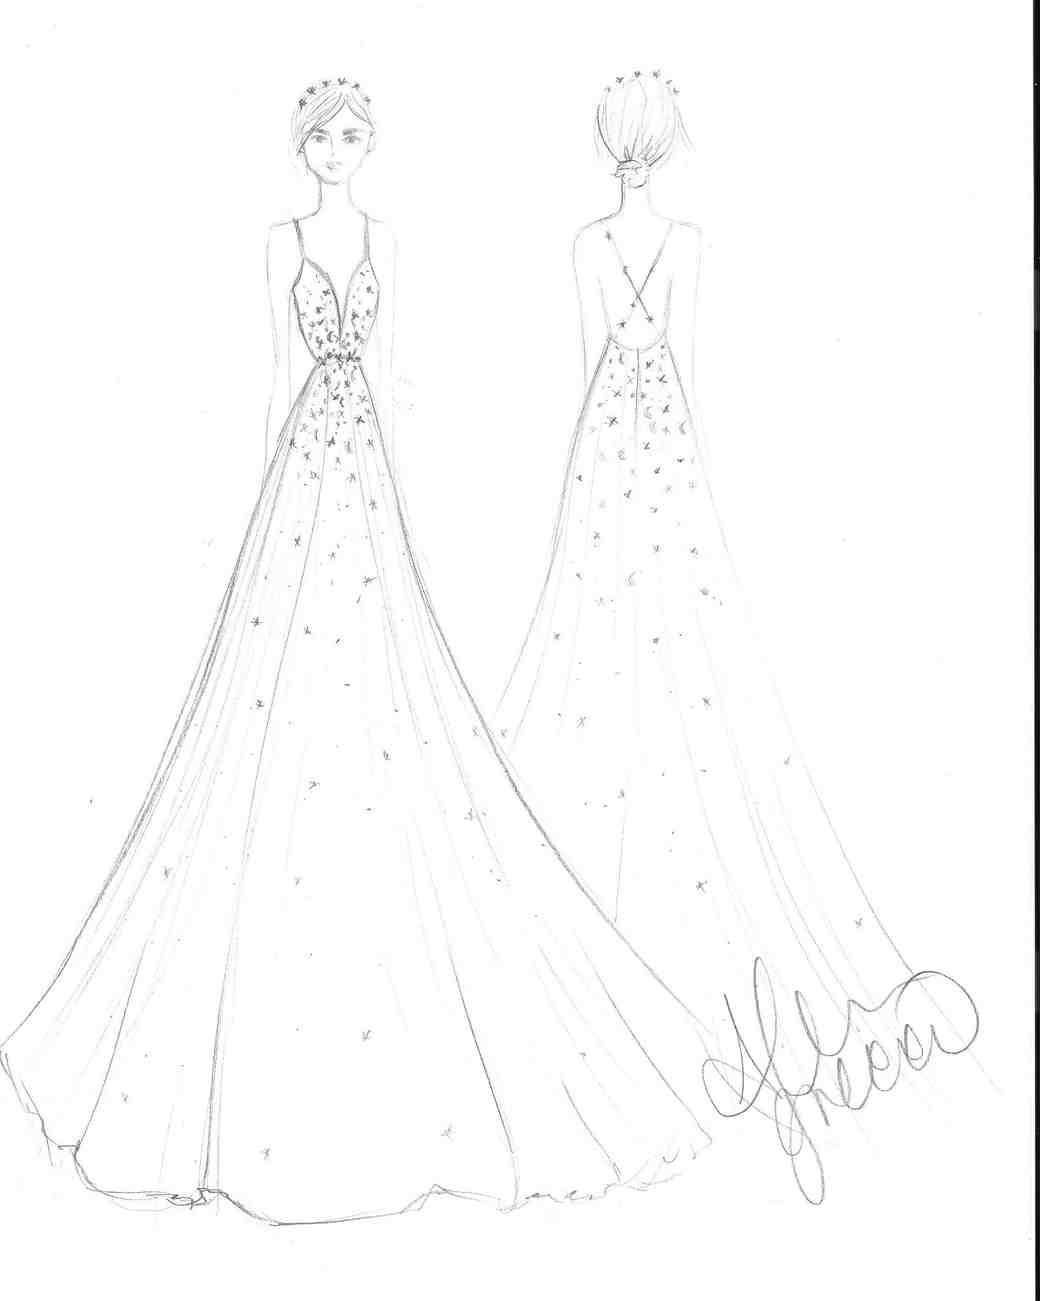 Drawn bride dress Spring Sketch BFW Bridal Spring